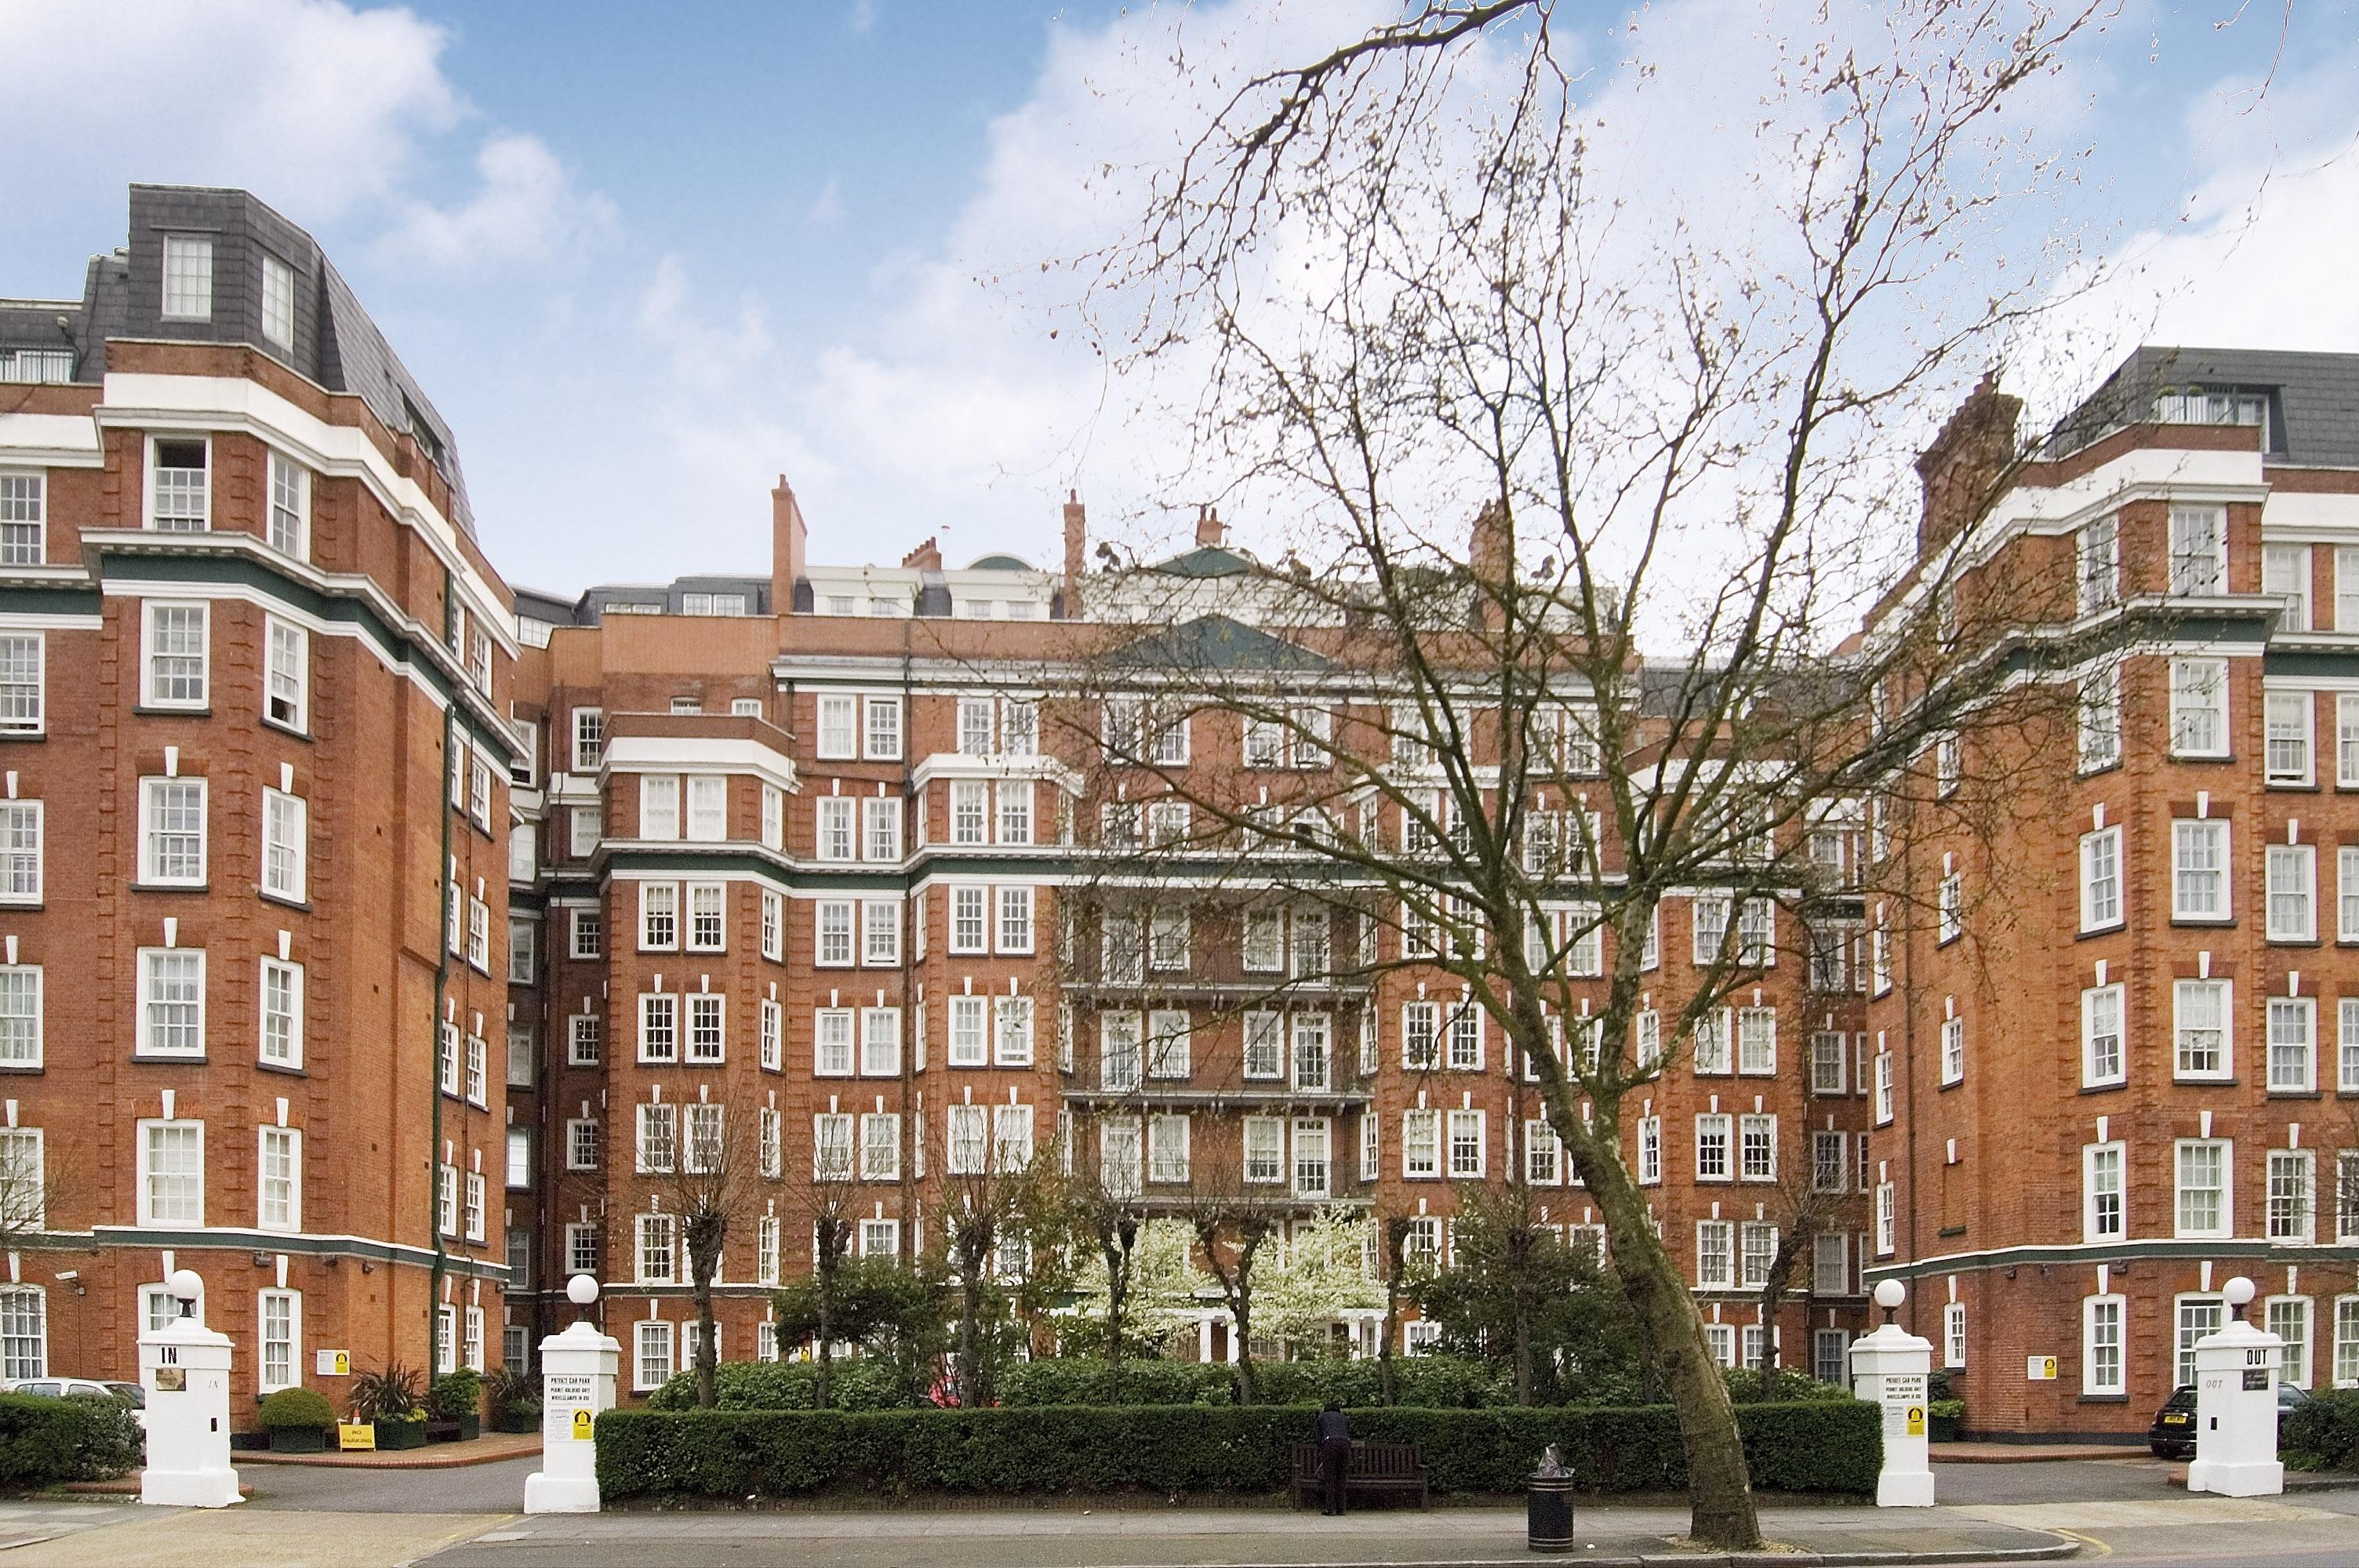 St Johns Wood Court, St Johns Wood Road, London, NW8